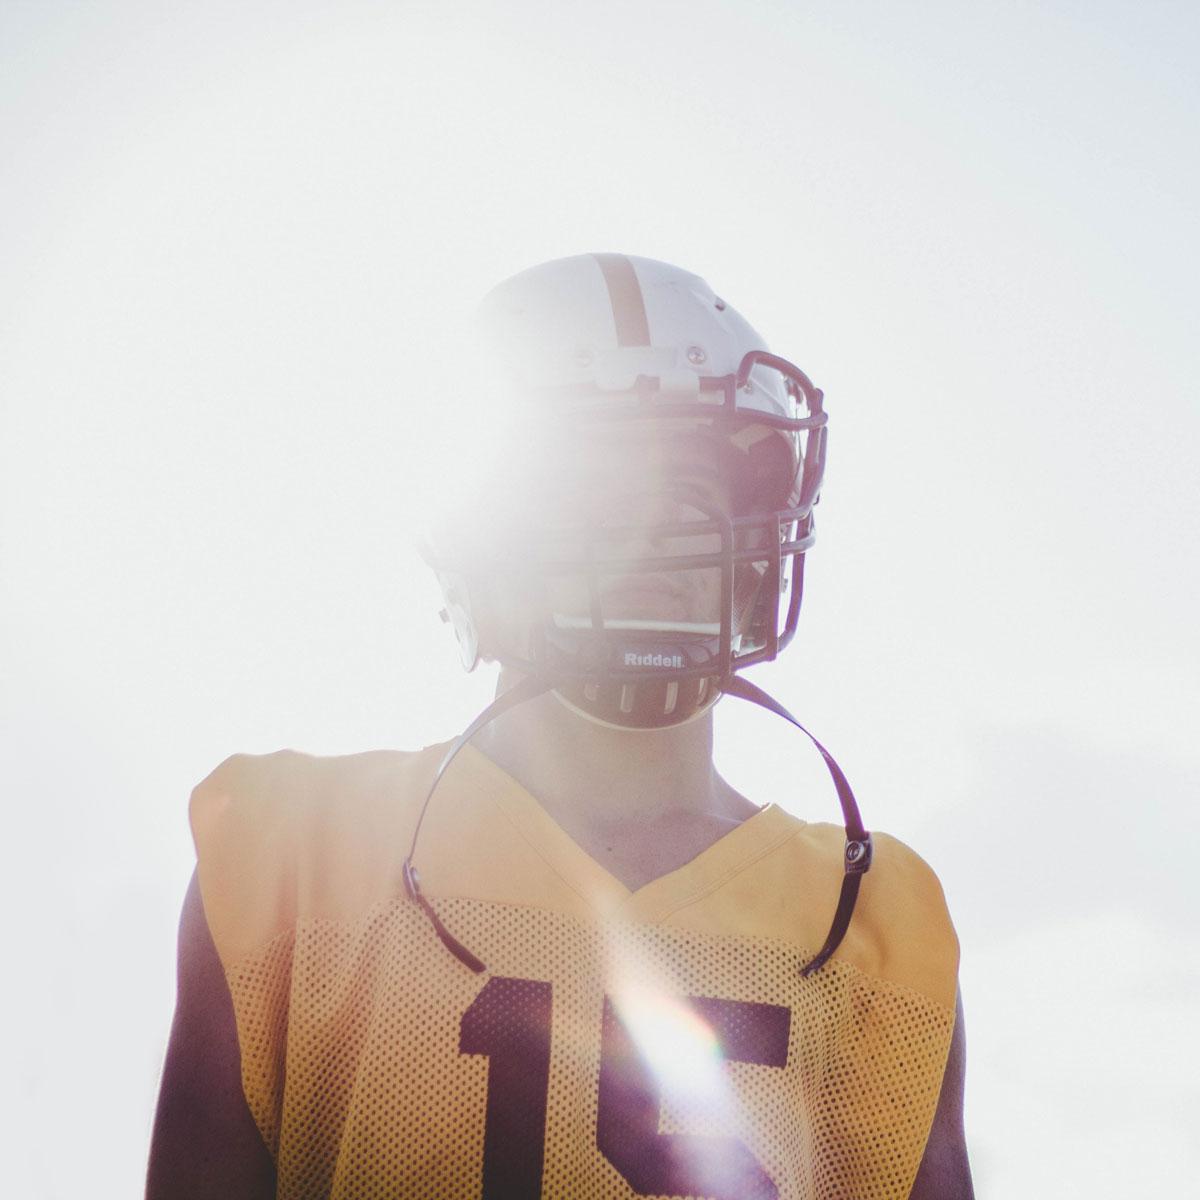 football-helmet-dude.jpg